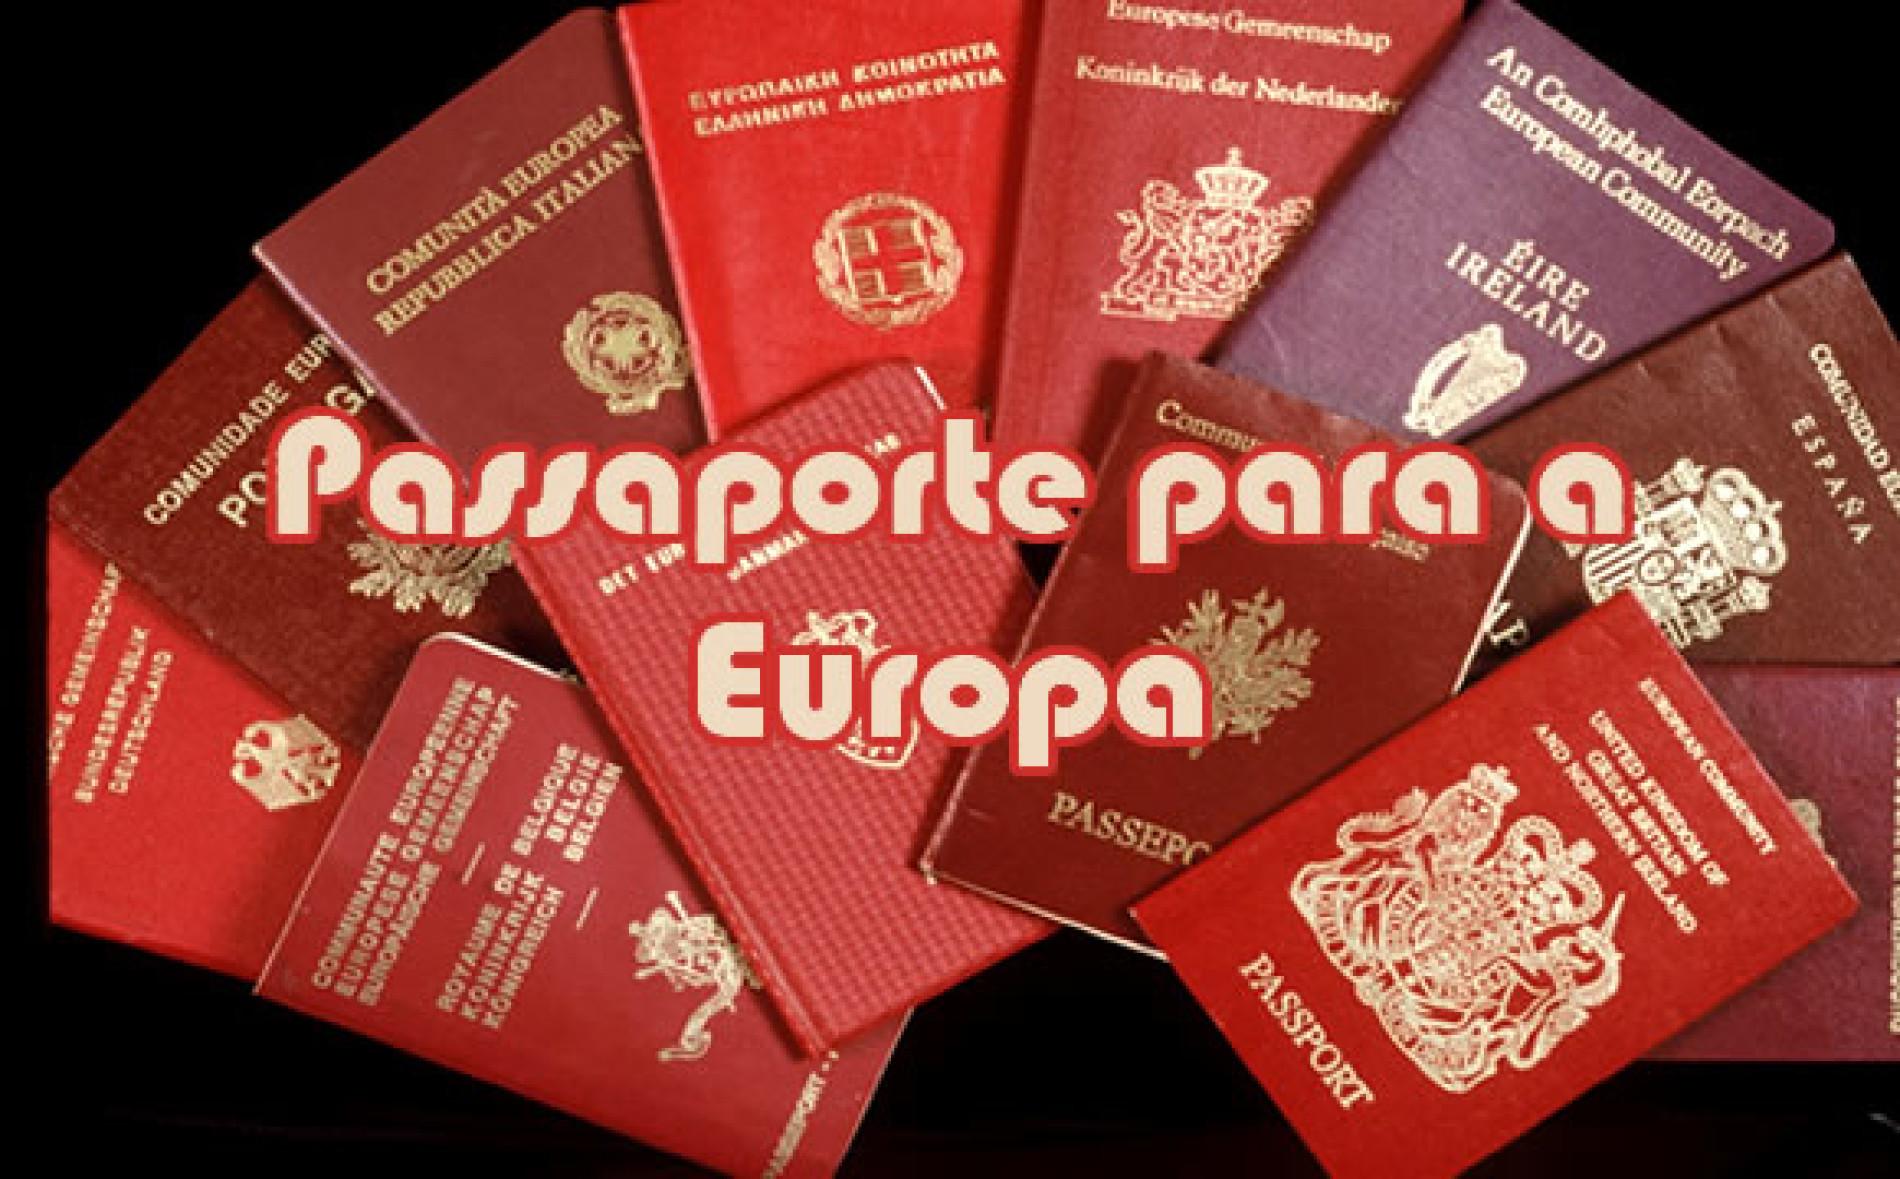 Novo Passaporte para a Europa